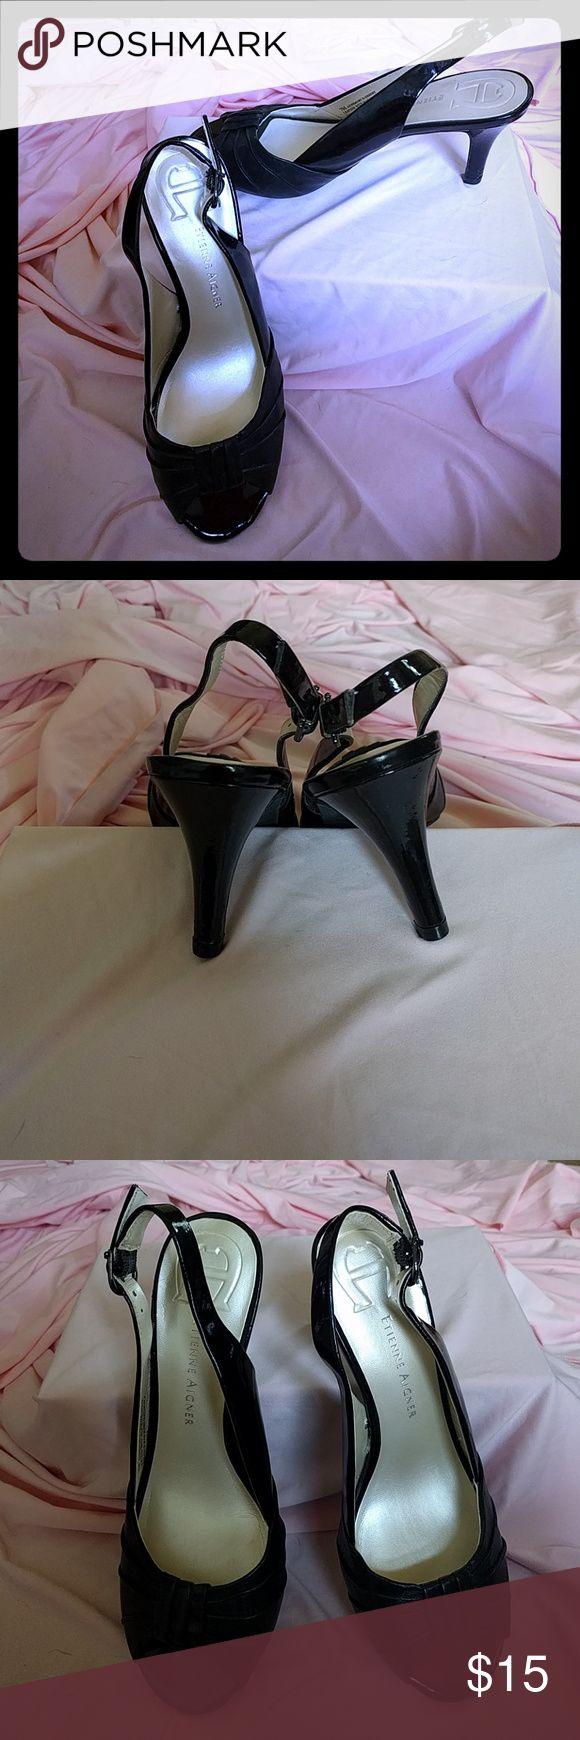 Etienne aigner black leather gloves - Etienne Aigner Sz 7 Black Dress Shoes Rarely Worn